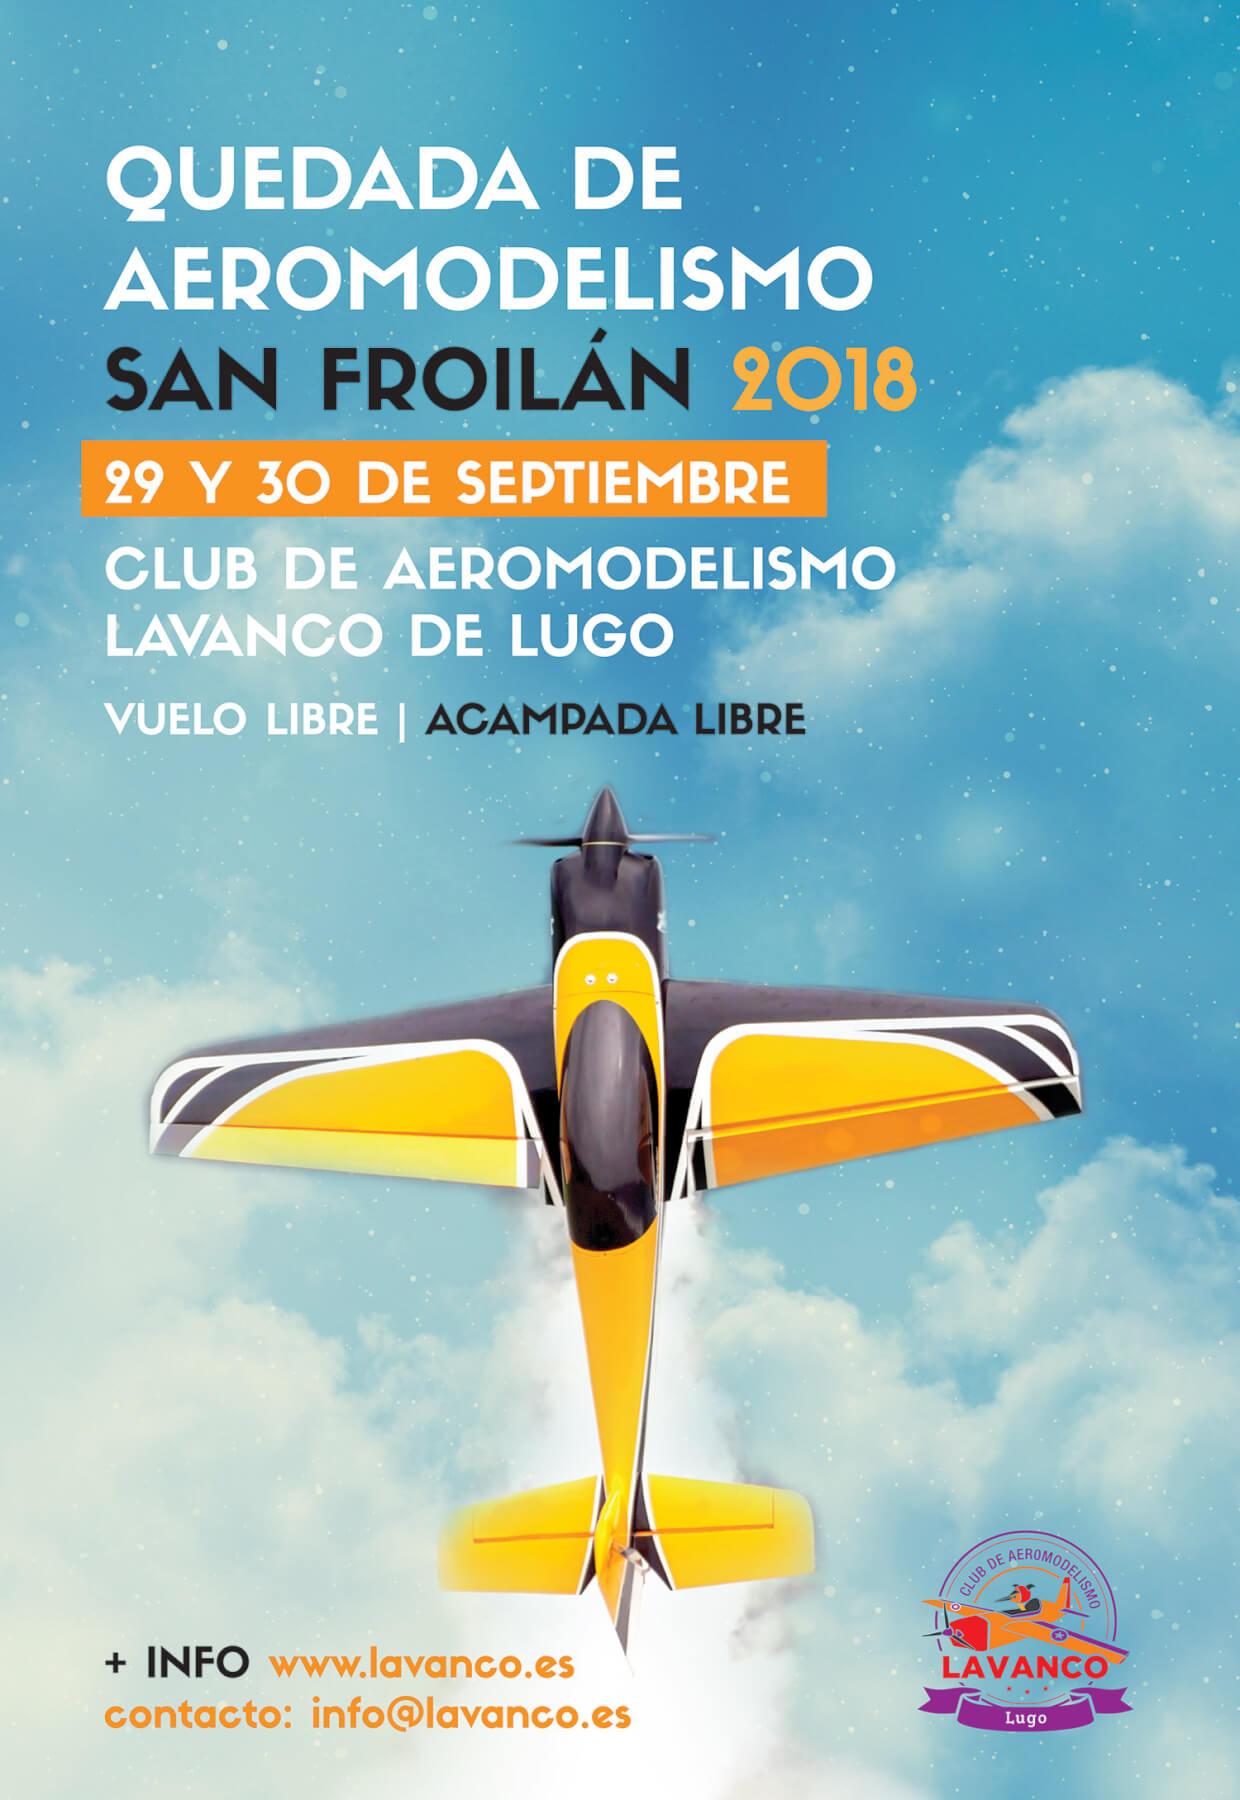 Quedada San Froilán 2018